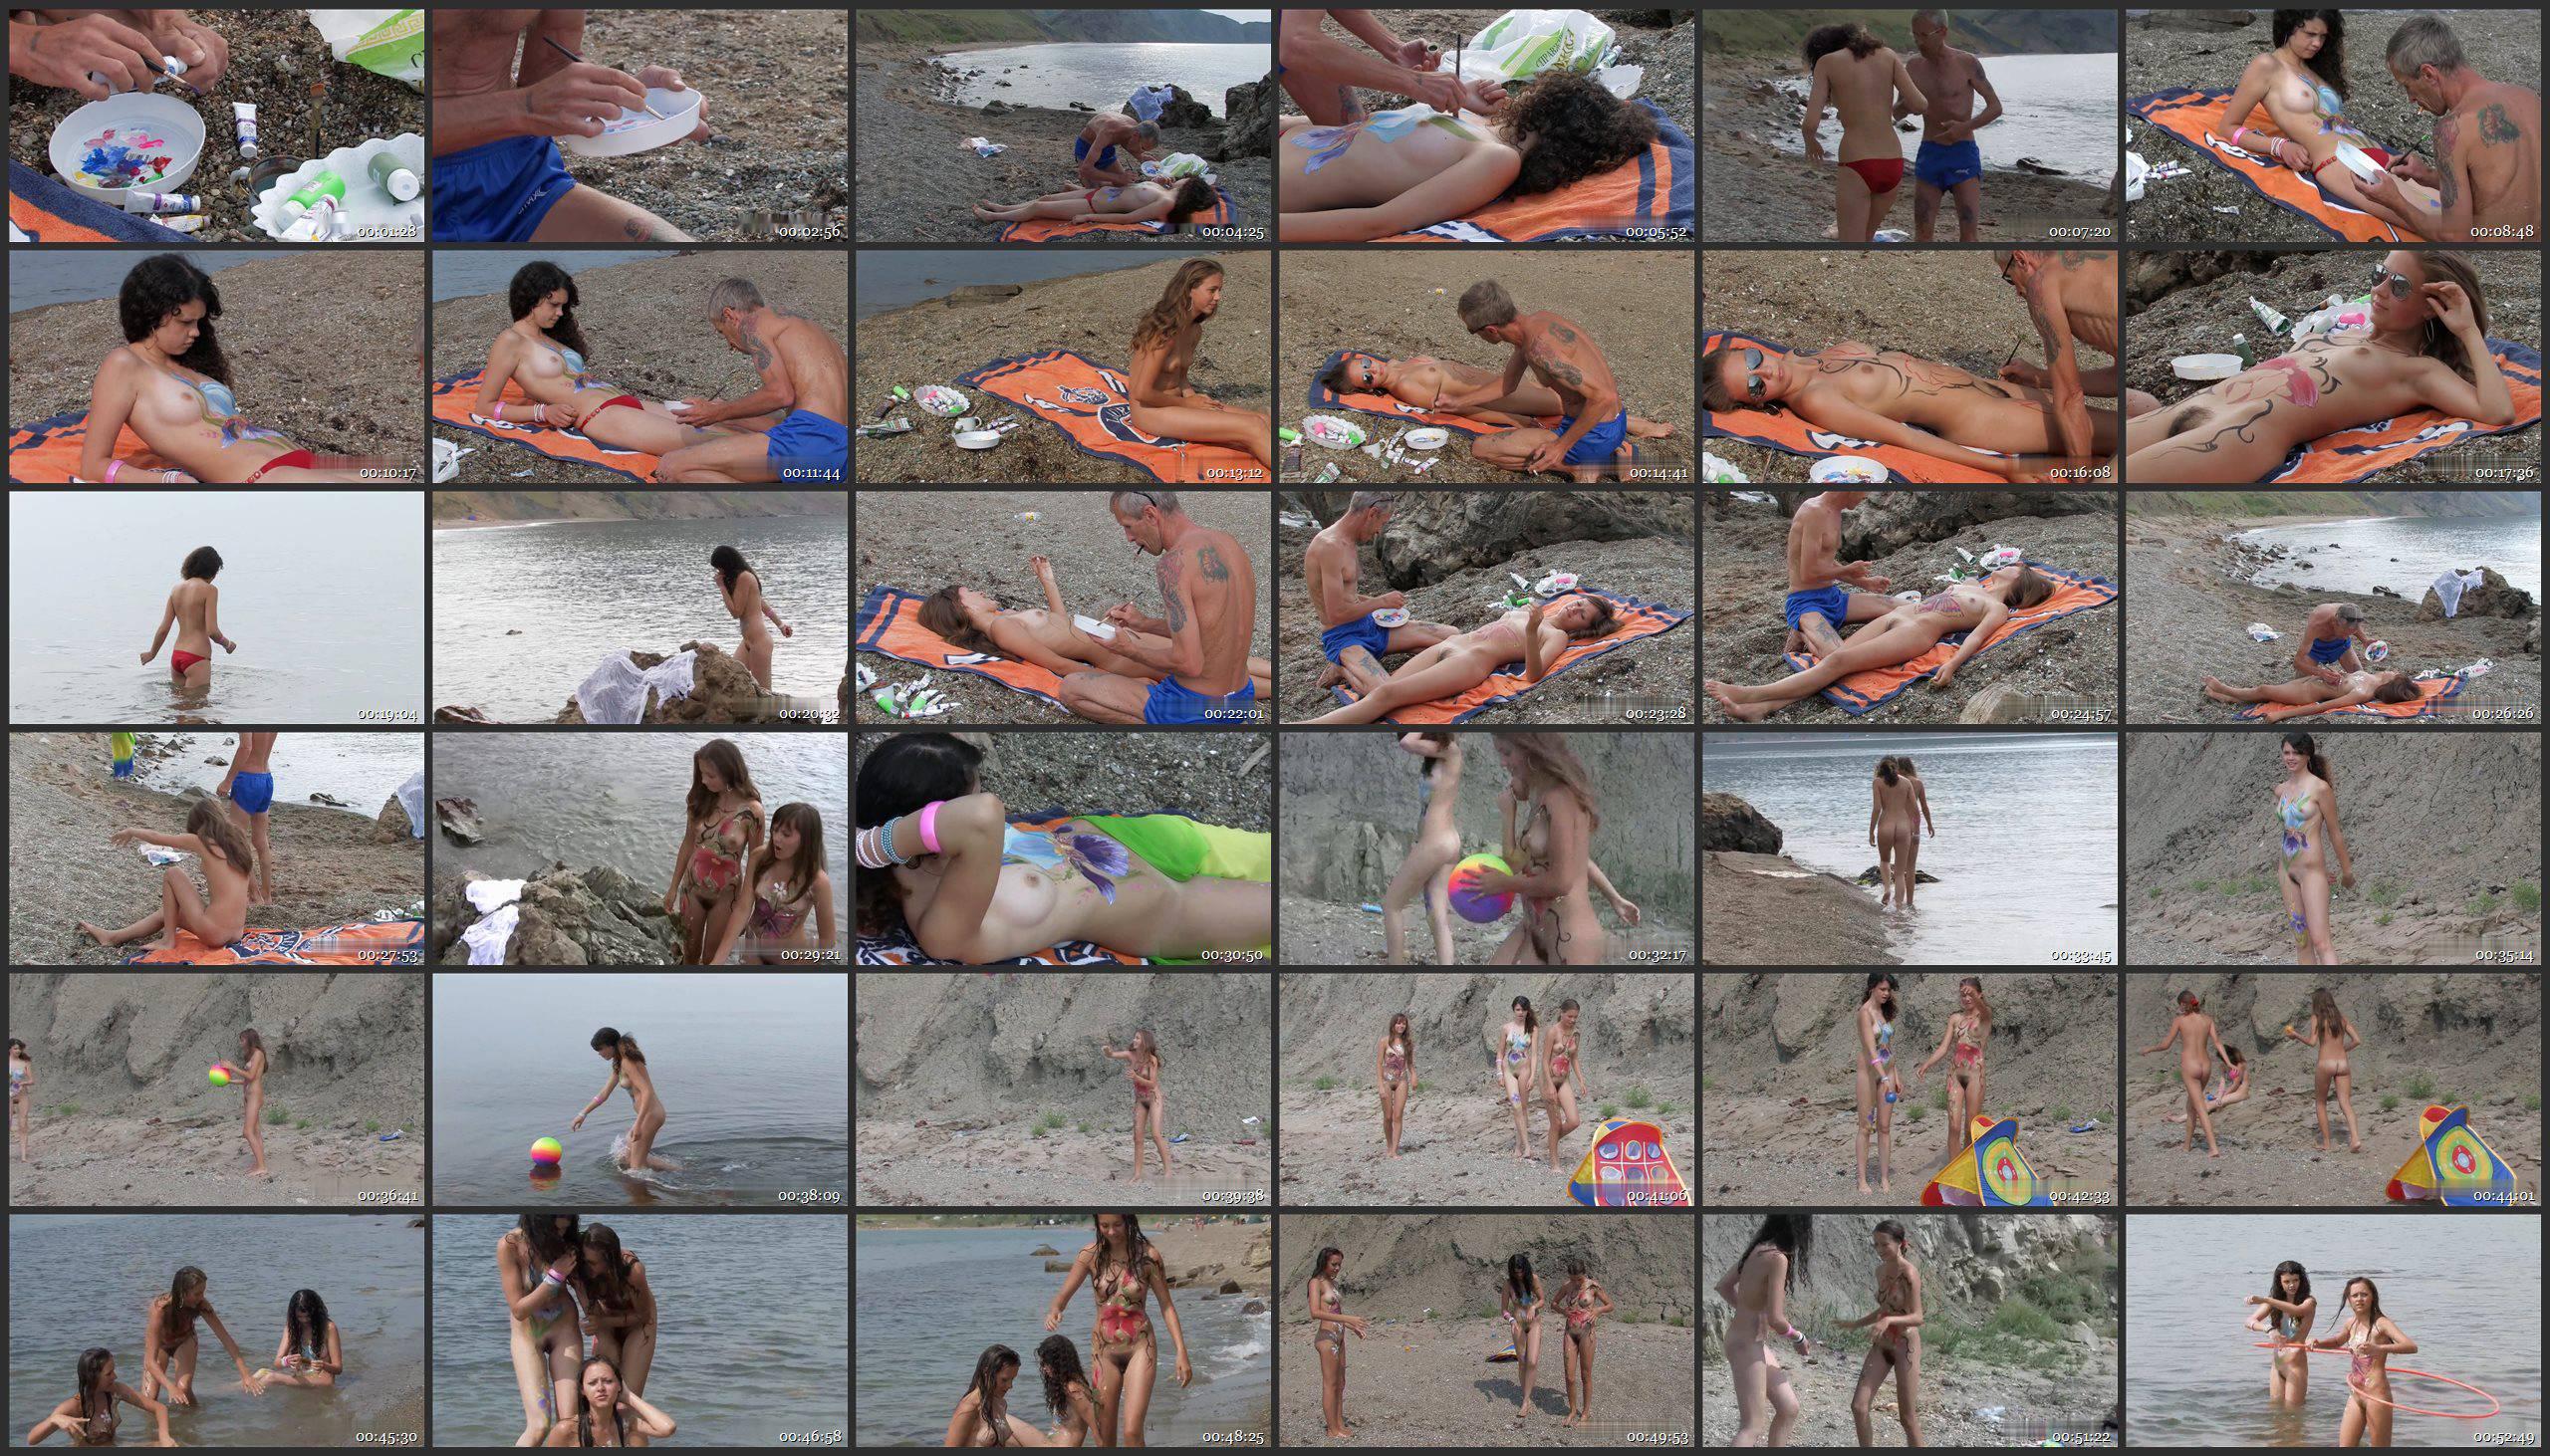 Candid-HD.com-Body Art Nudist Beach. Part 1 - Thumbnails